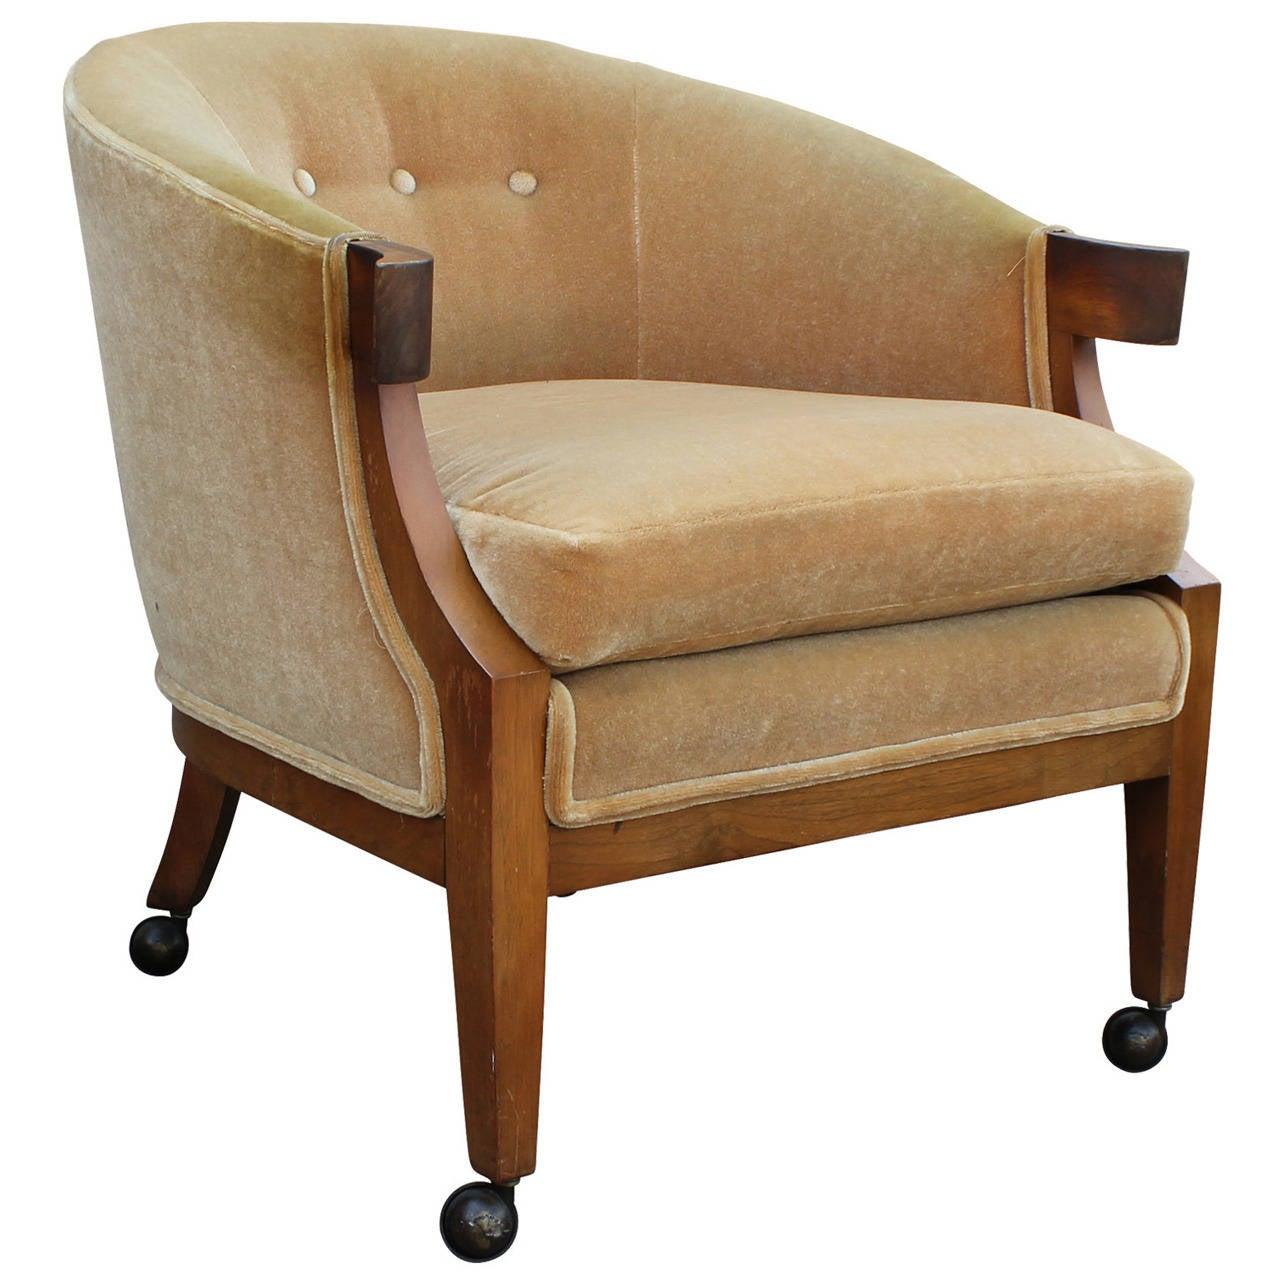 barrel back chair beach umbrella elegant hollywood regency gold mohair by